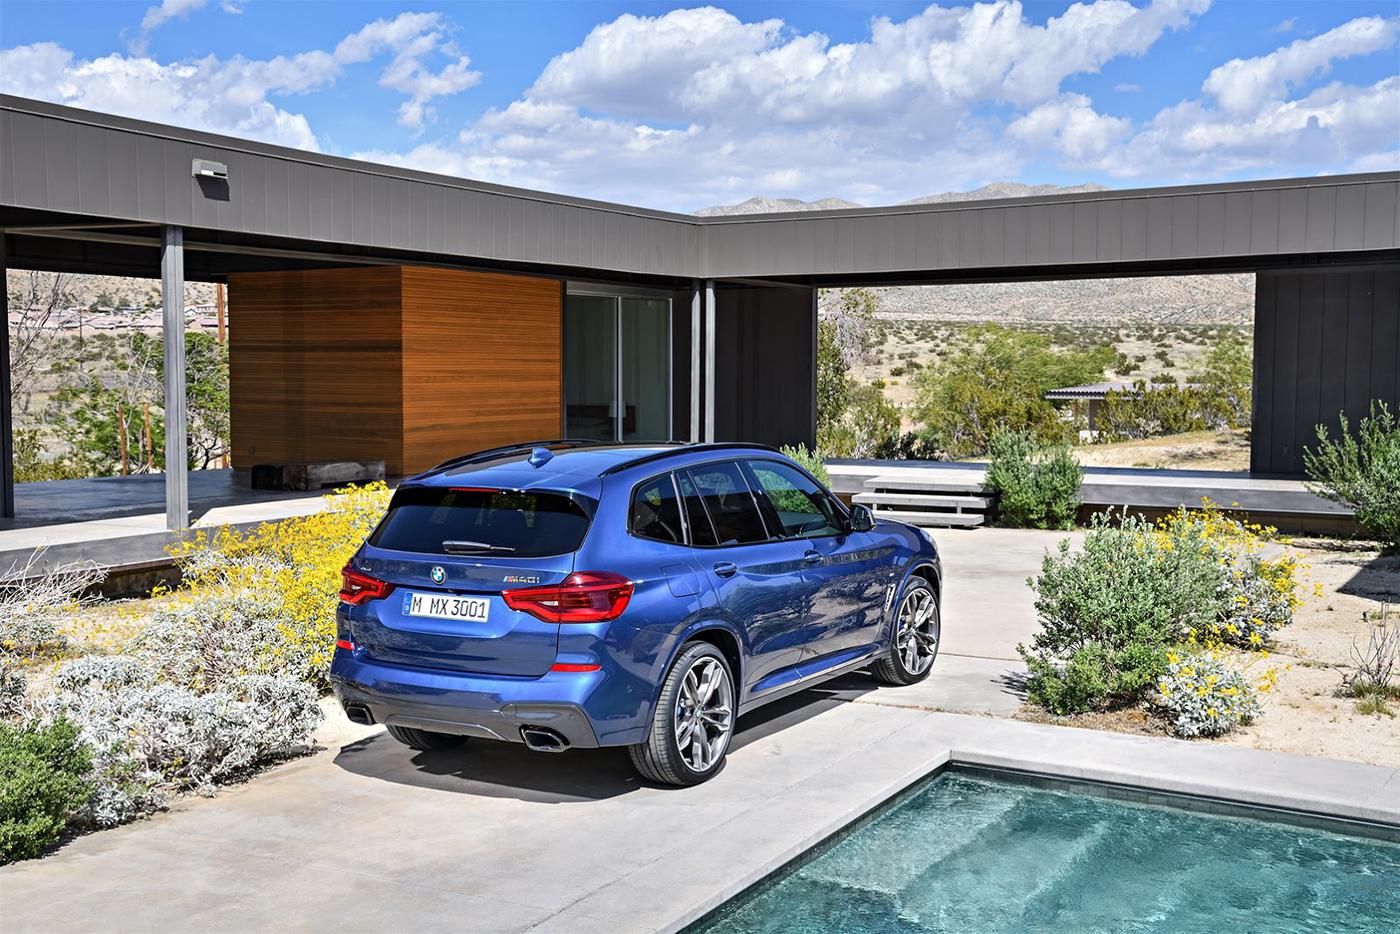 2018 BMW X3 thế hệ mới